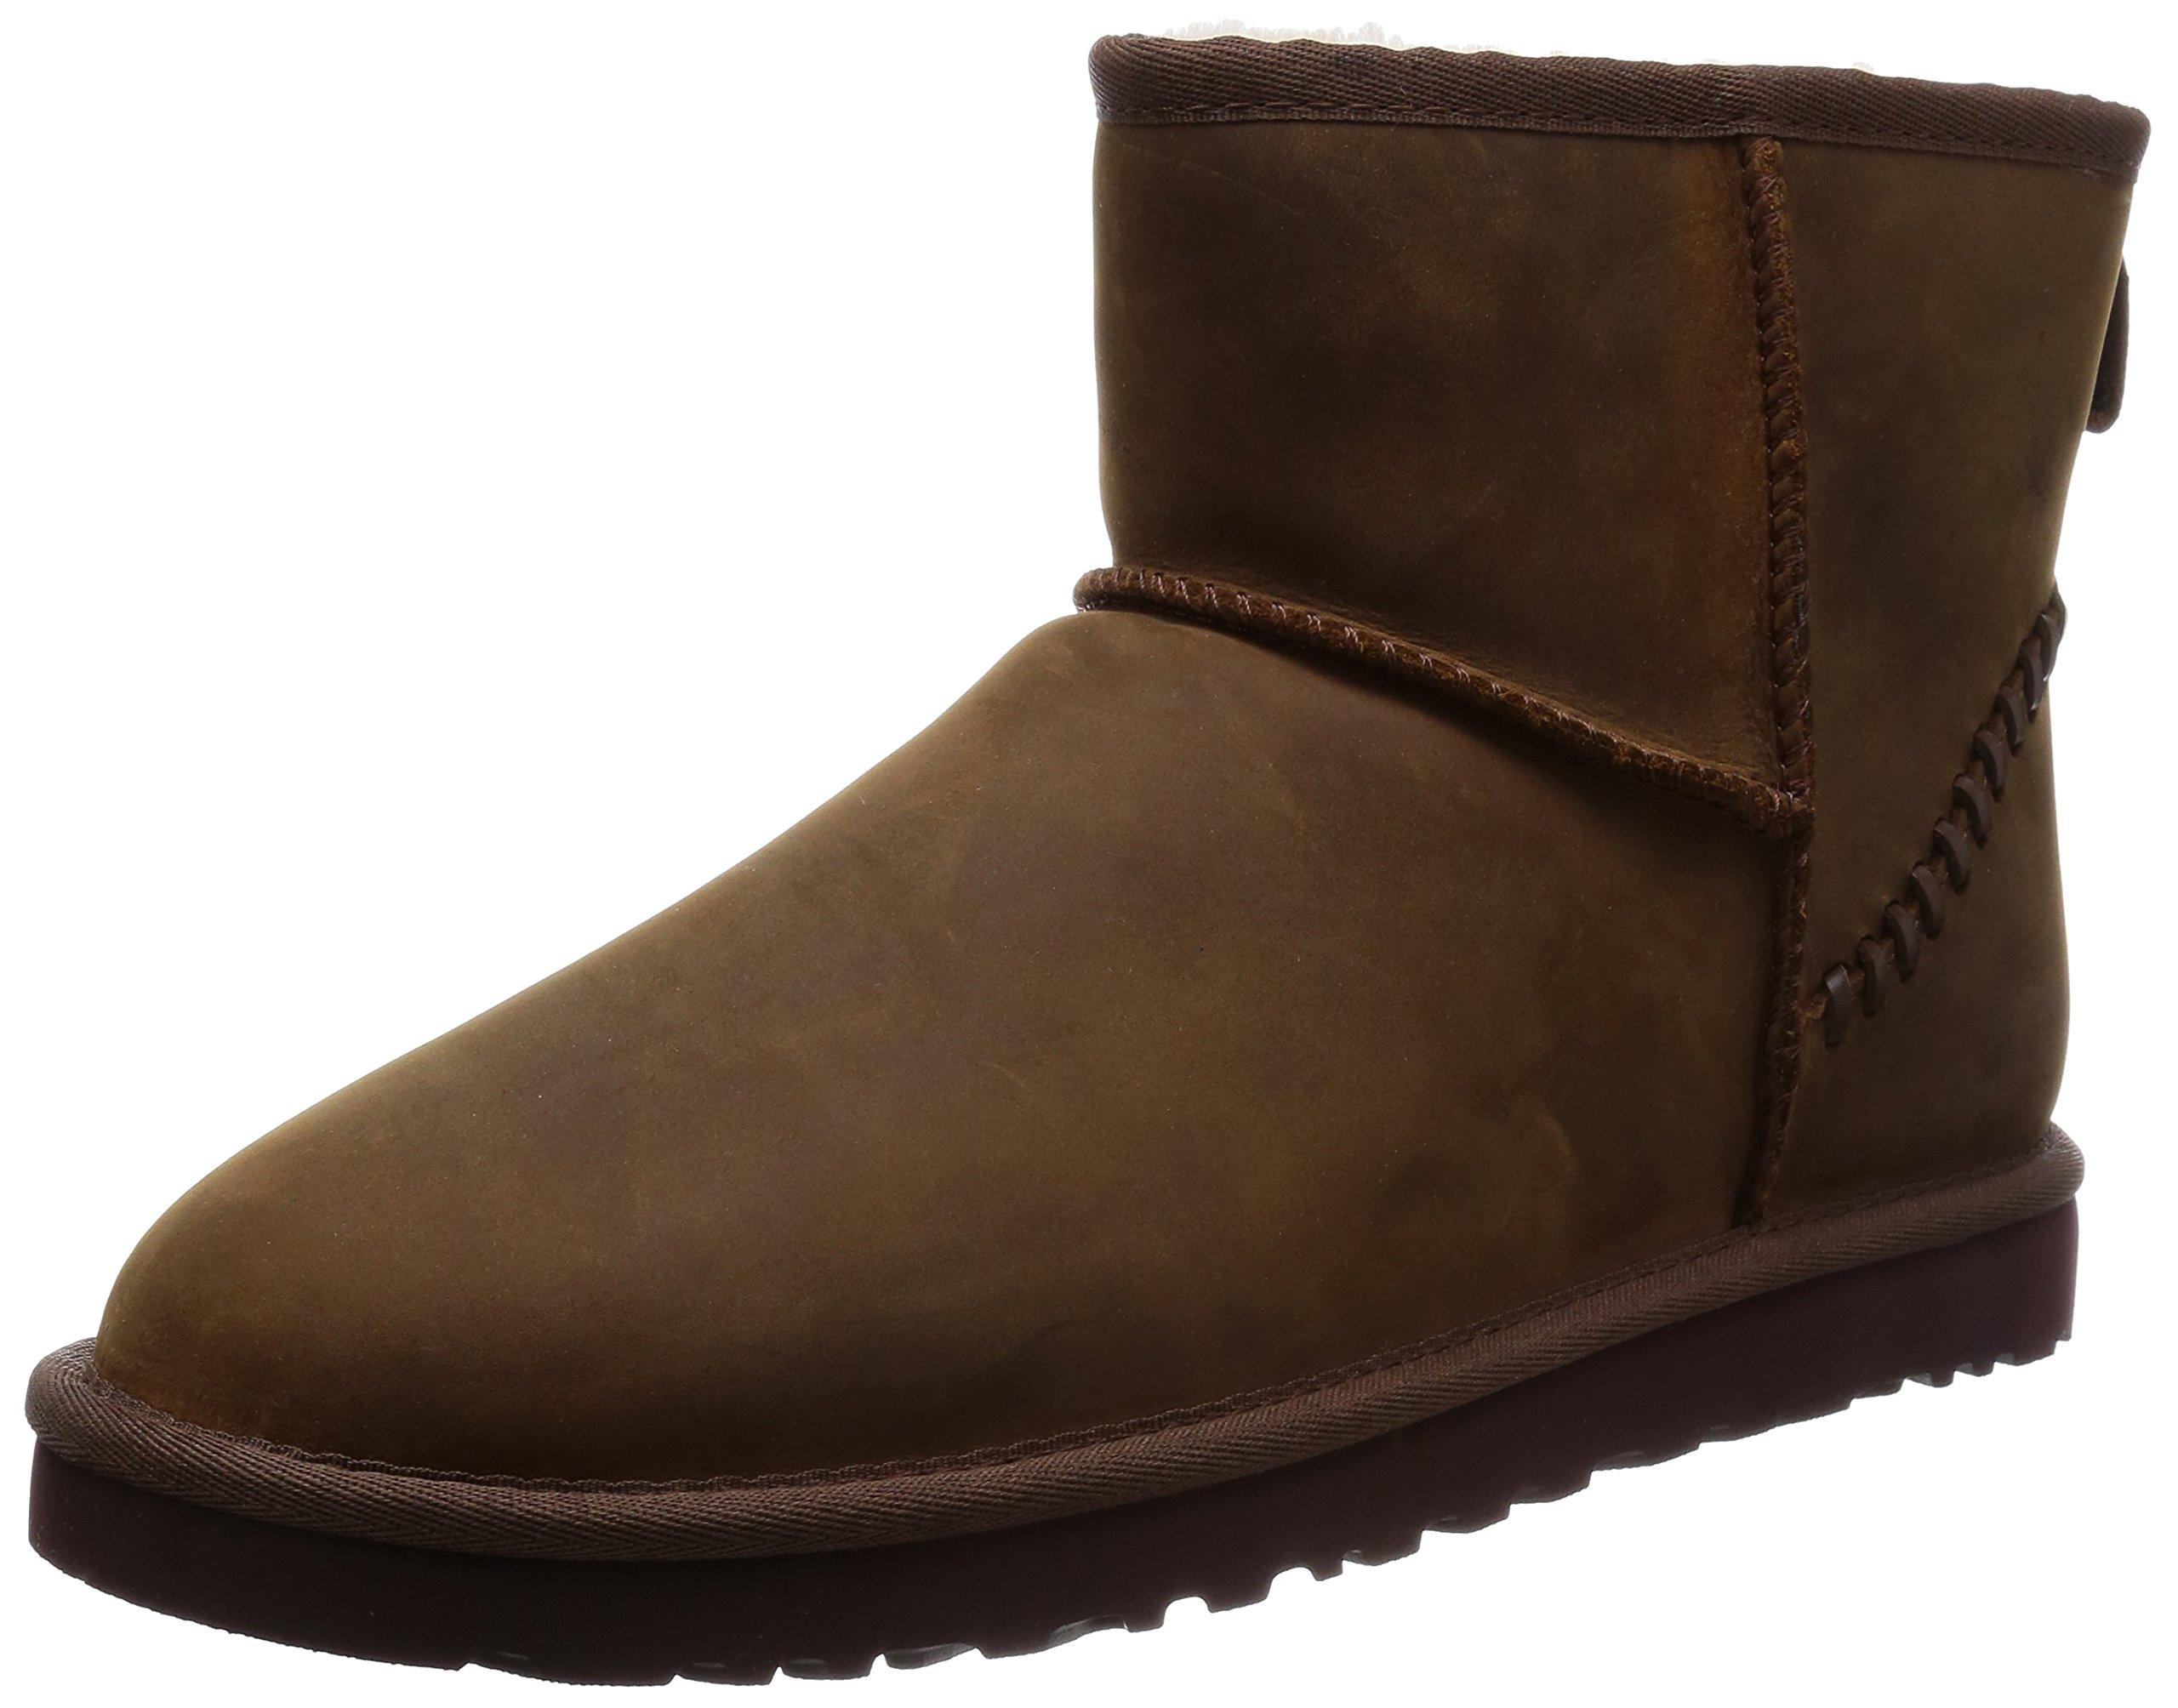 UGG Men's Classic Mini Deco Chestnut Leather Boot 8 D (M)